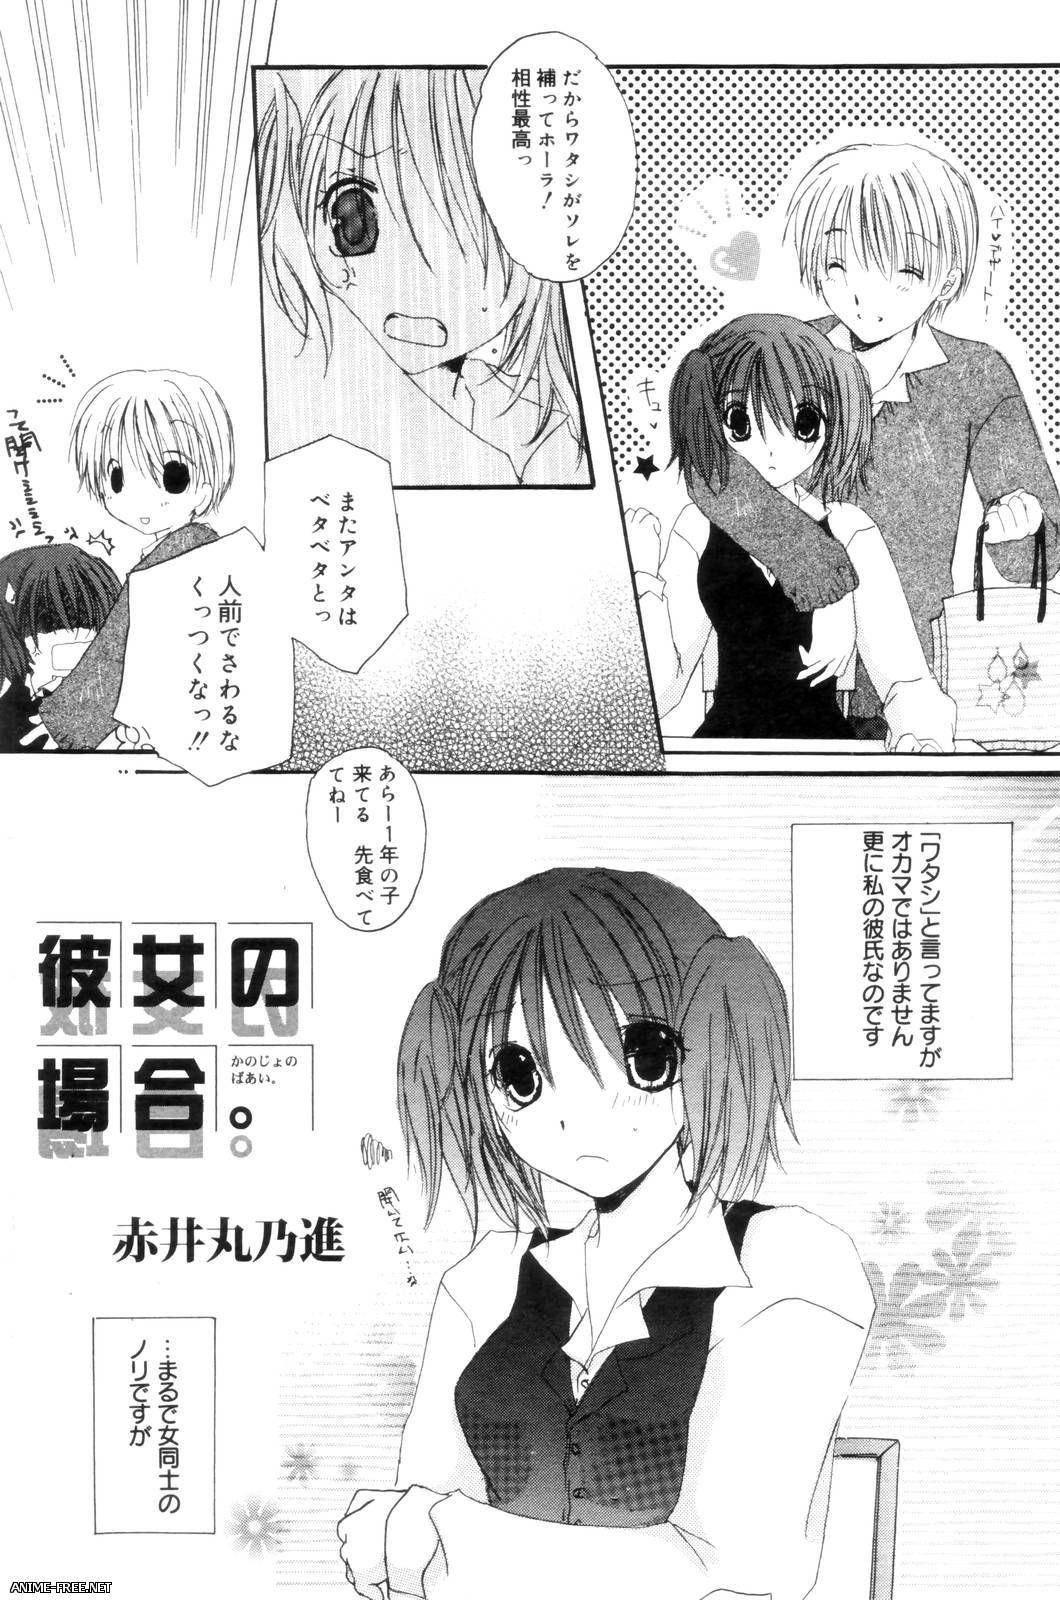 Сборник журналов - Manga Bangaichi [Cen] [JAP] Manga Hentai